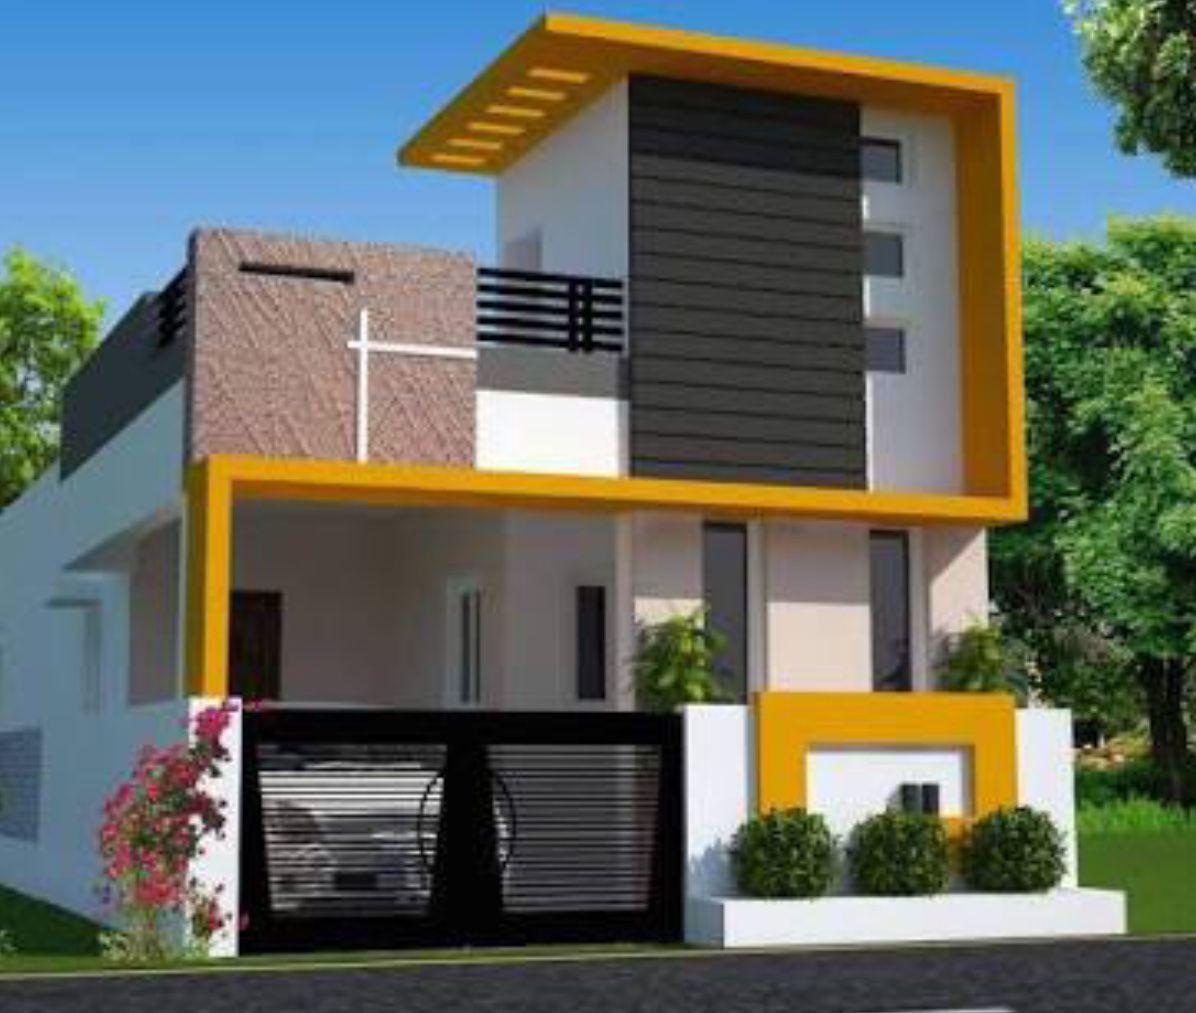 Building elevation house front designs independent also rh pinterest